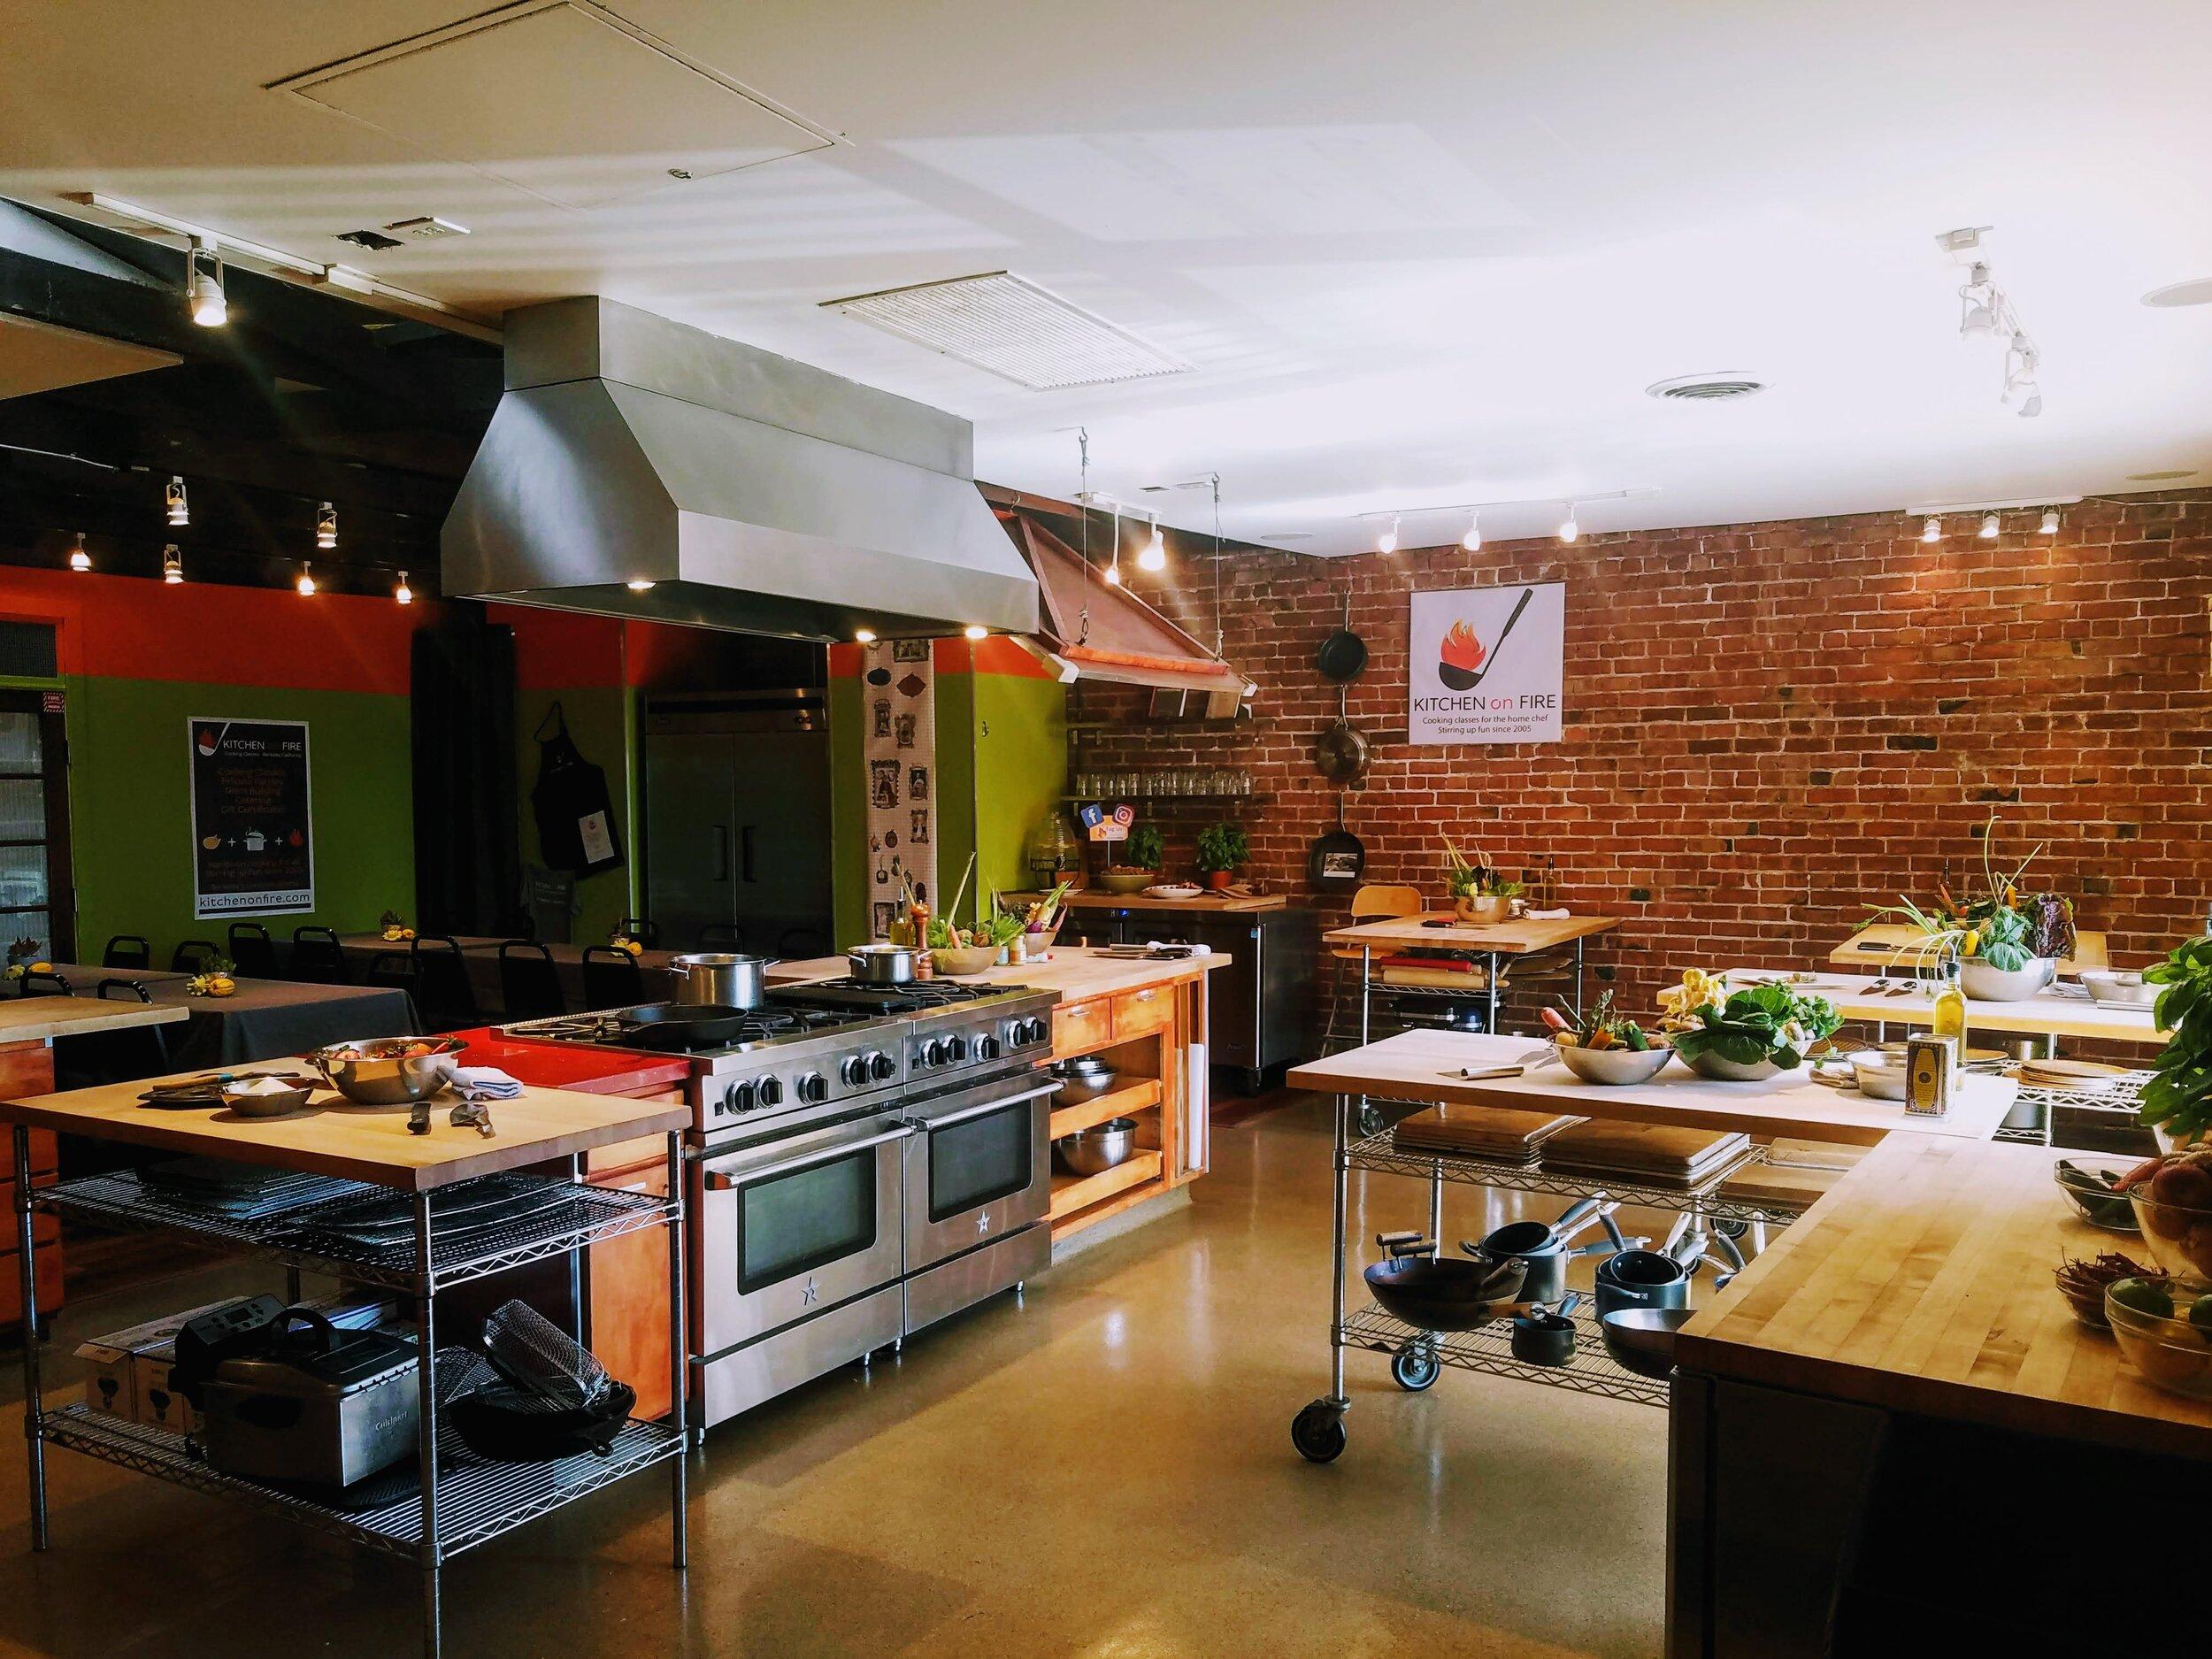 Kitchen on Fire Berkeley 18.jpg